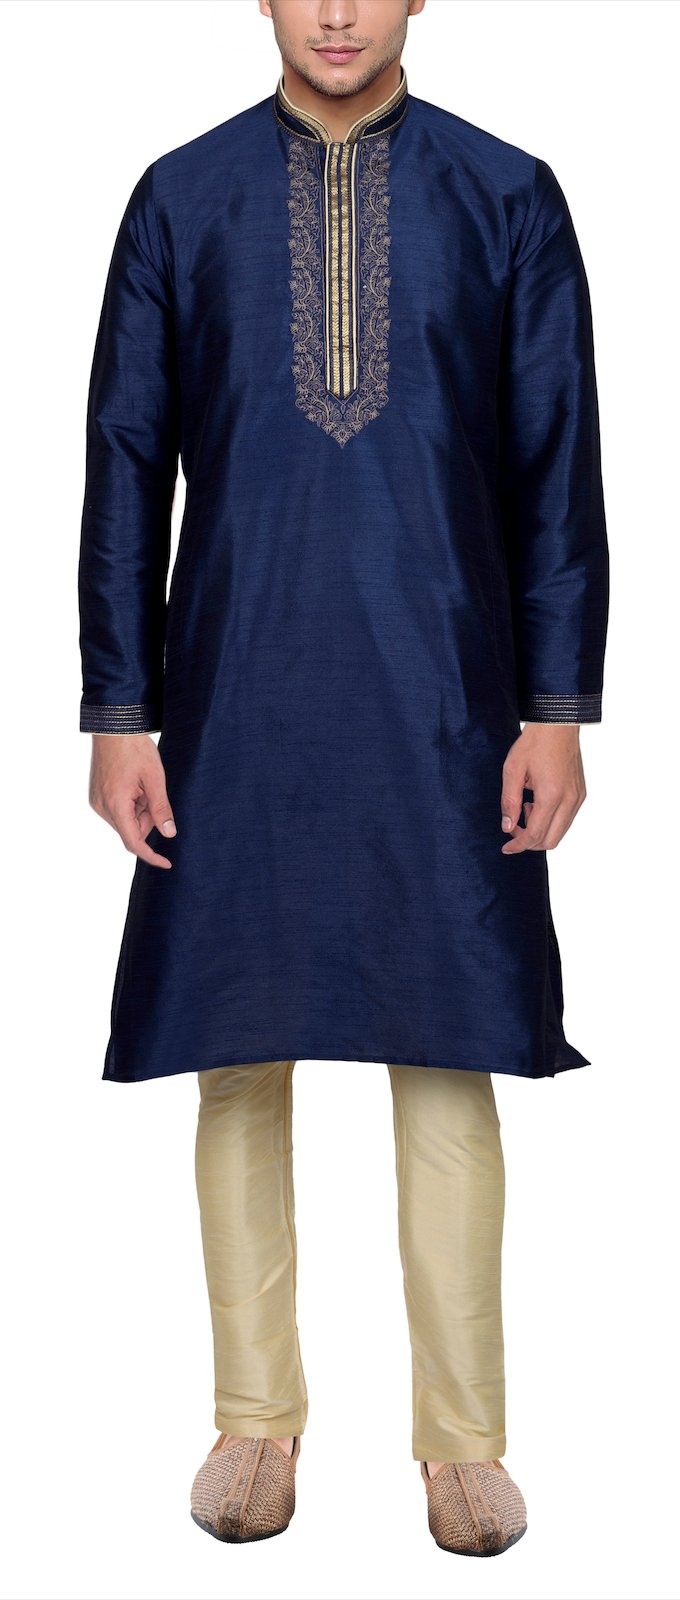 Maharaja Mens Raw Silk Embroidered Festive Kurta Pyjama Set in Blue [MSKP015-40]